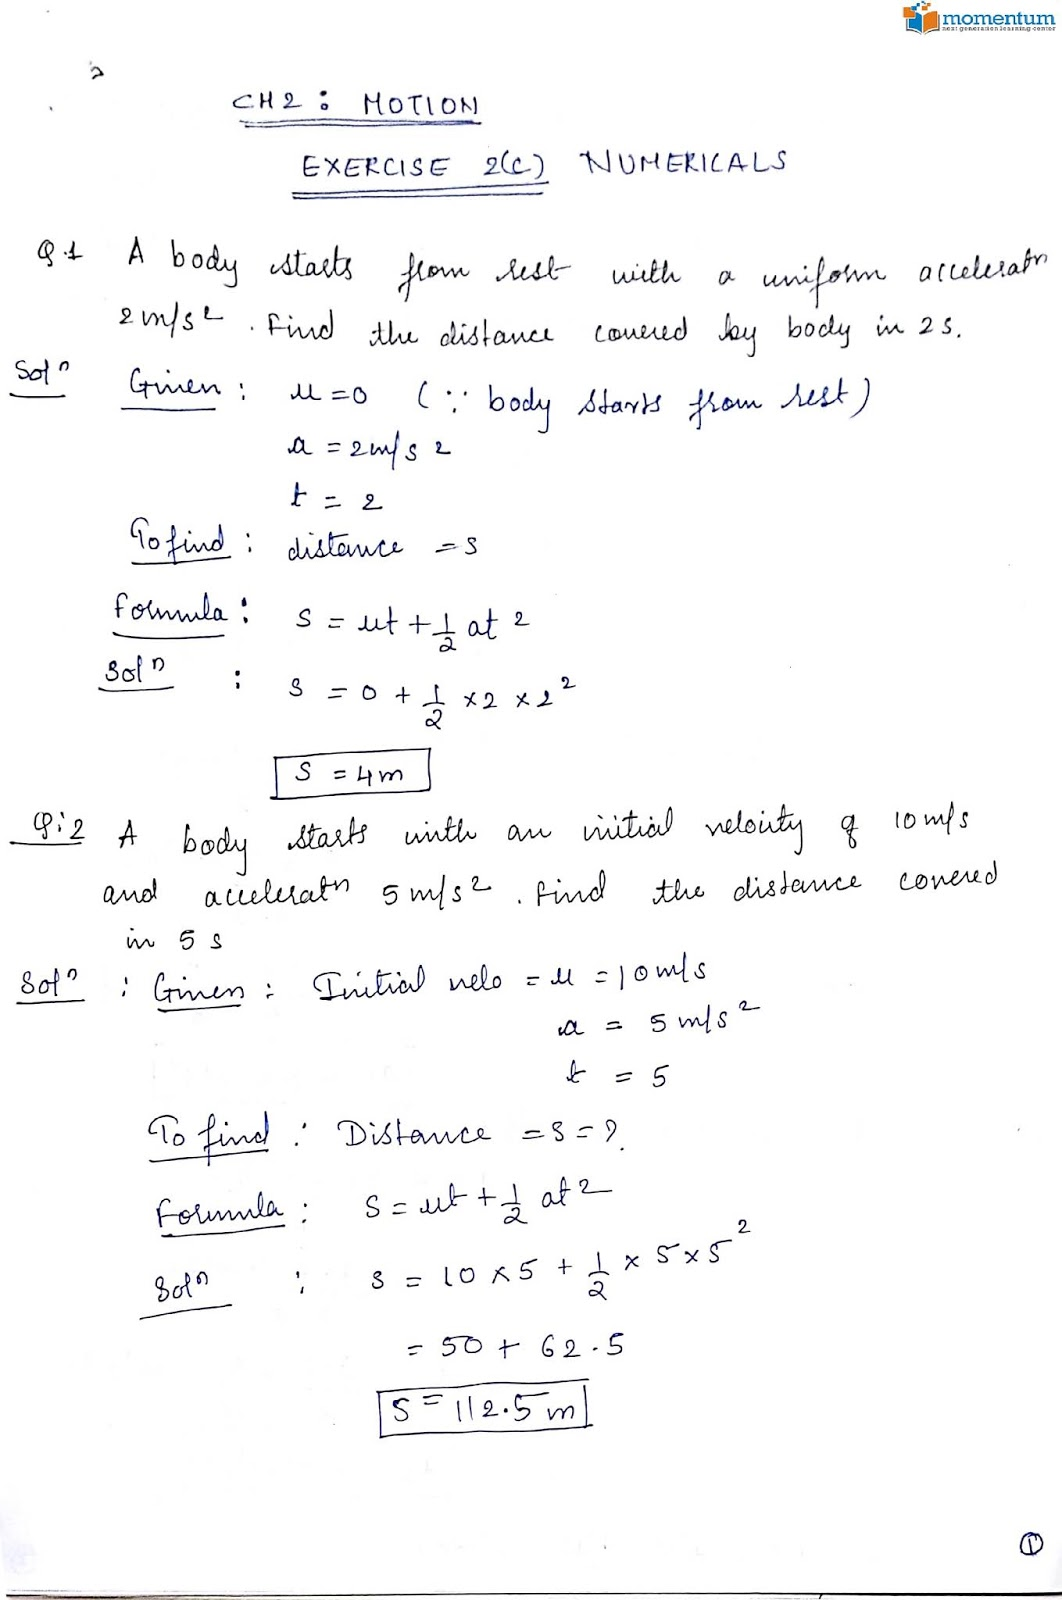 ICSE Class 9 Physics : Chapter 2 Motion Exercise (2C)